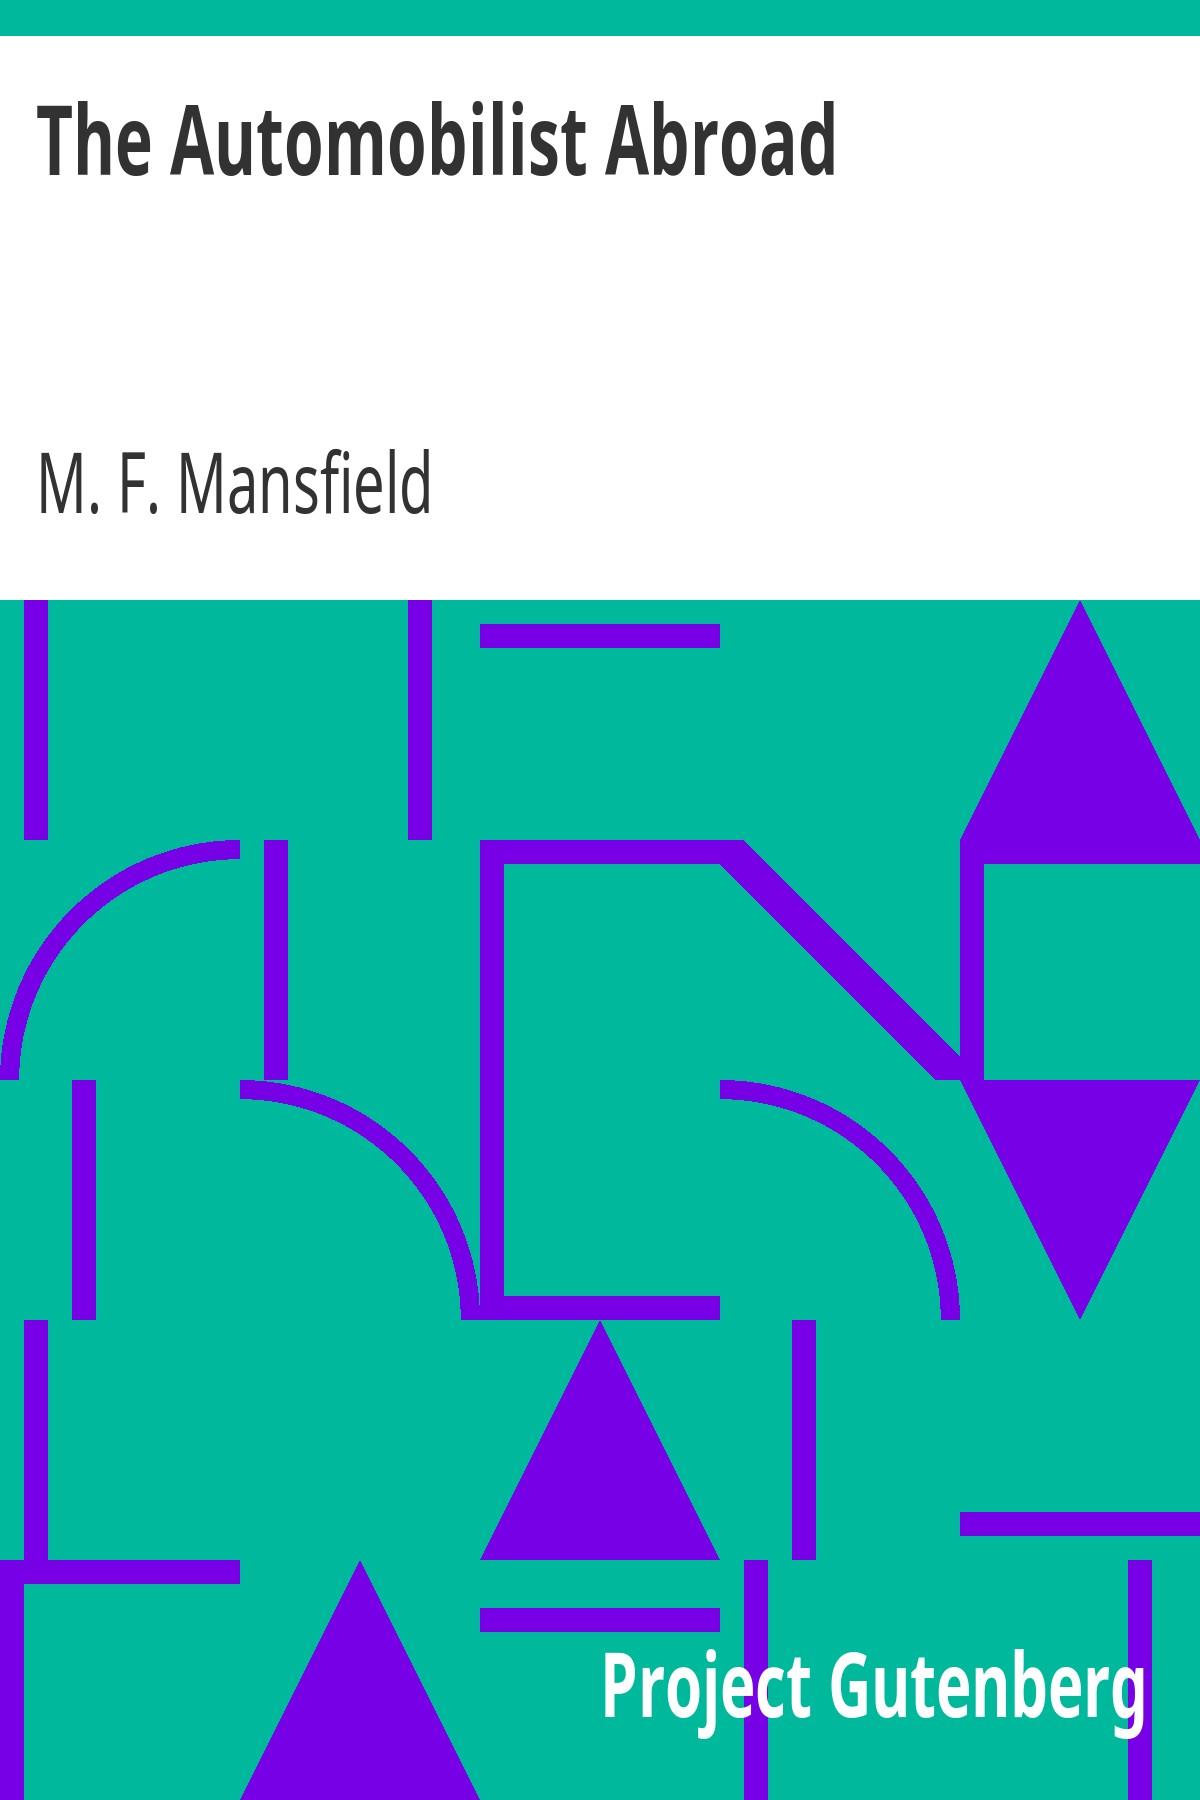 Milburg Francisco Mansfield The Automobilist Abroad